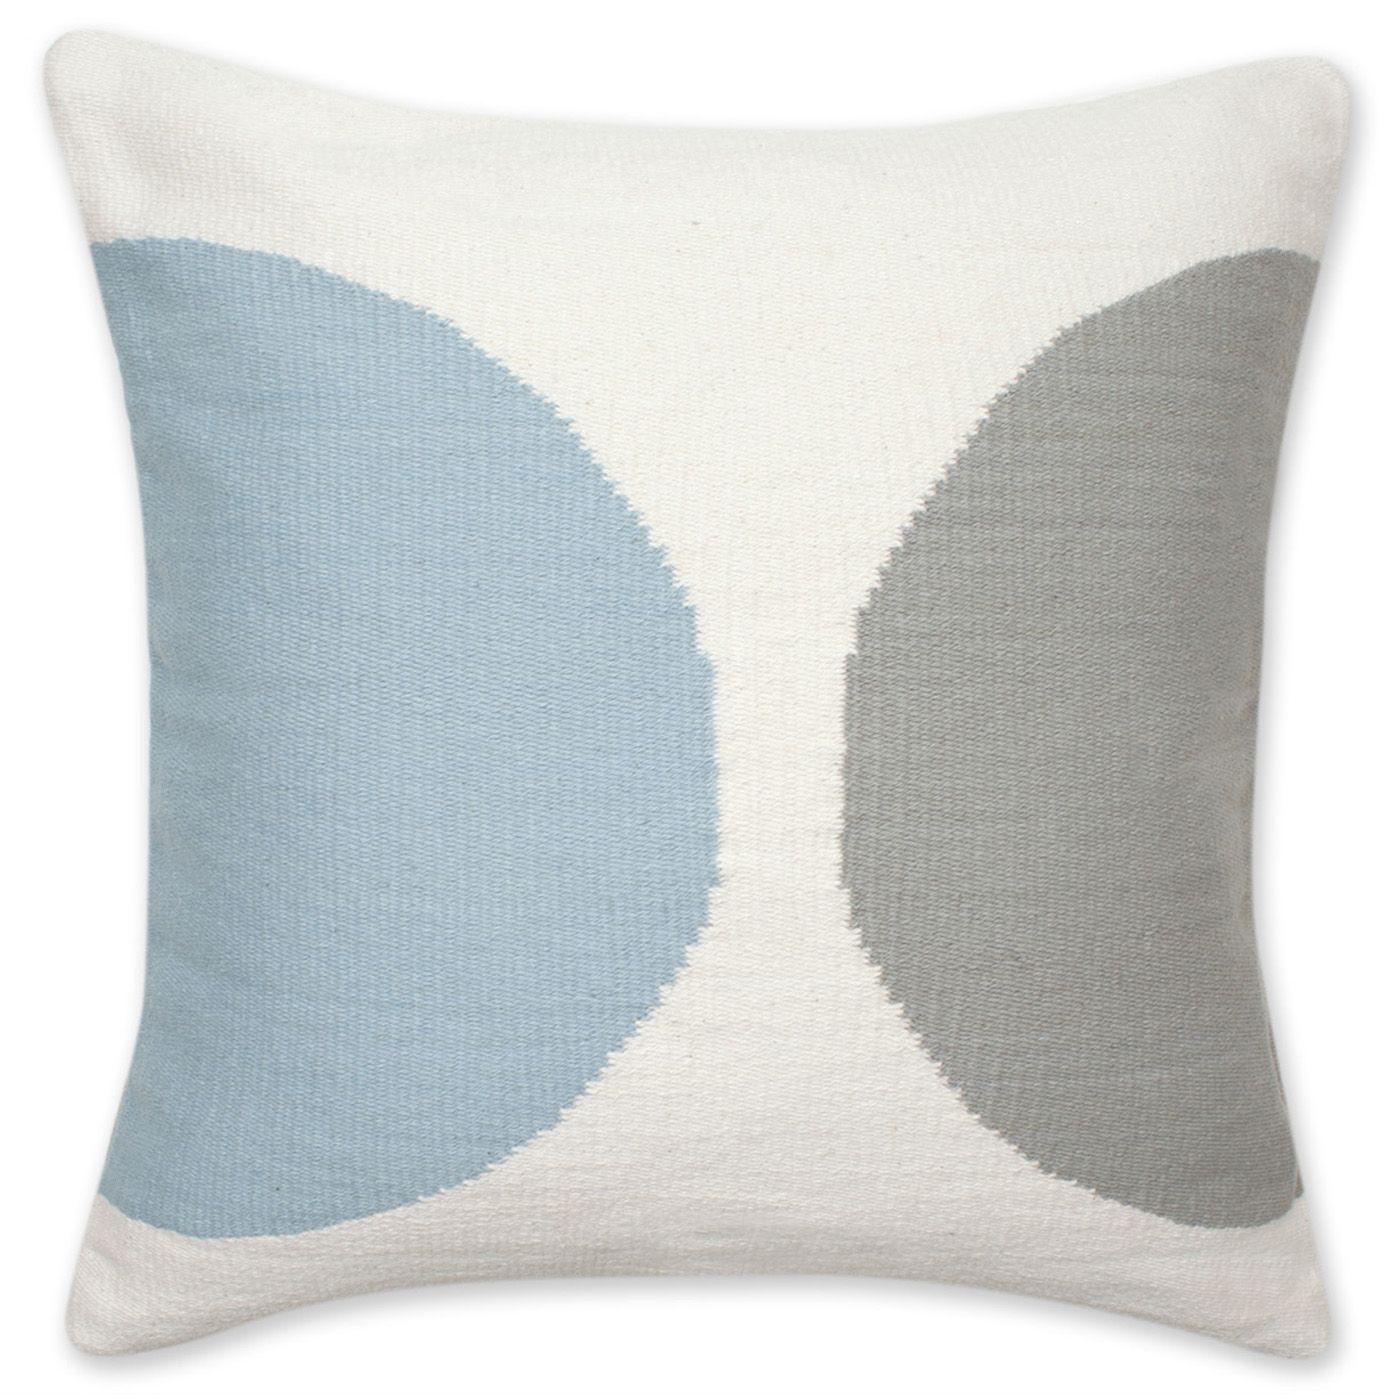 Jonathan Adler Reversible Blue And Grey Half Circle Pop Throw Pillow In Woven Pop Pillows Modern Throw Pillows Wool Throw Pillows Throw Pillows